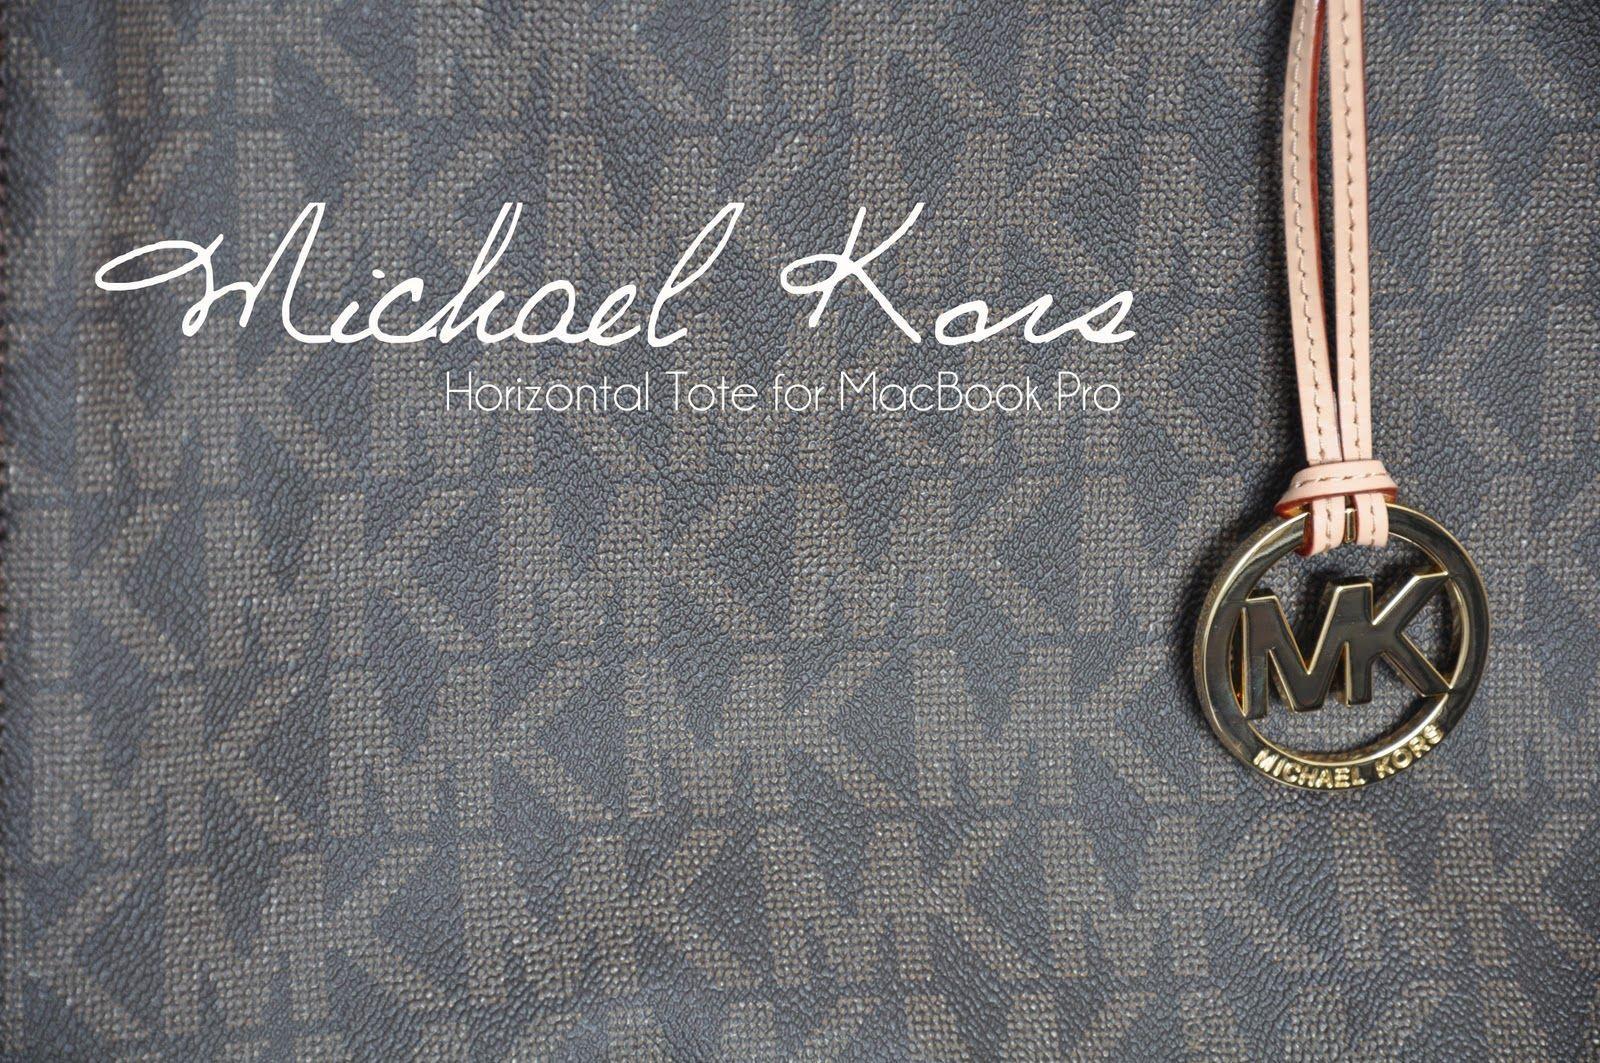 Michael Kors Wallpapers - Top Free